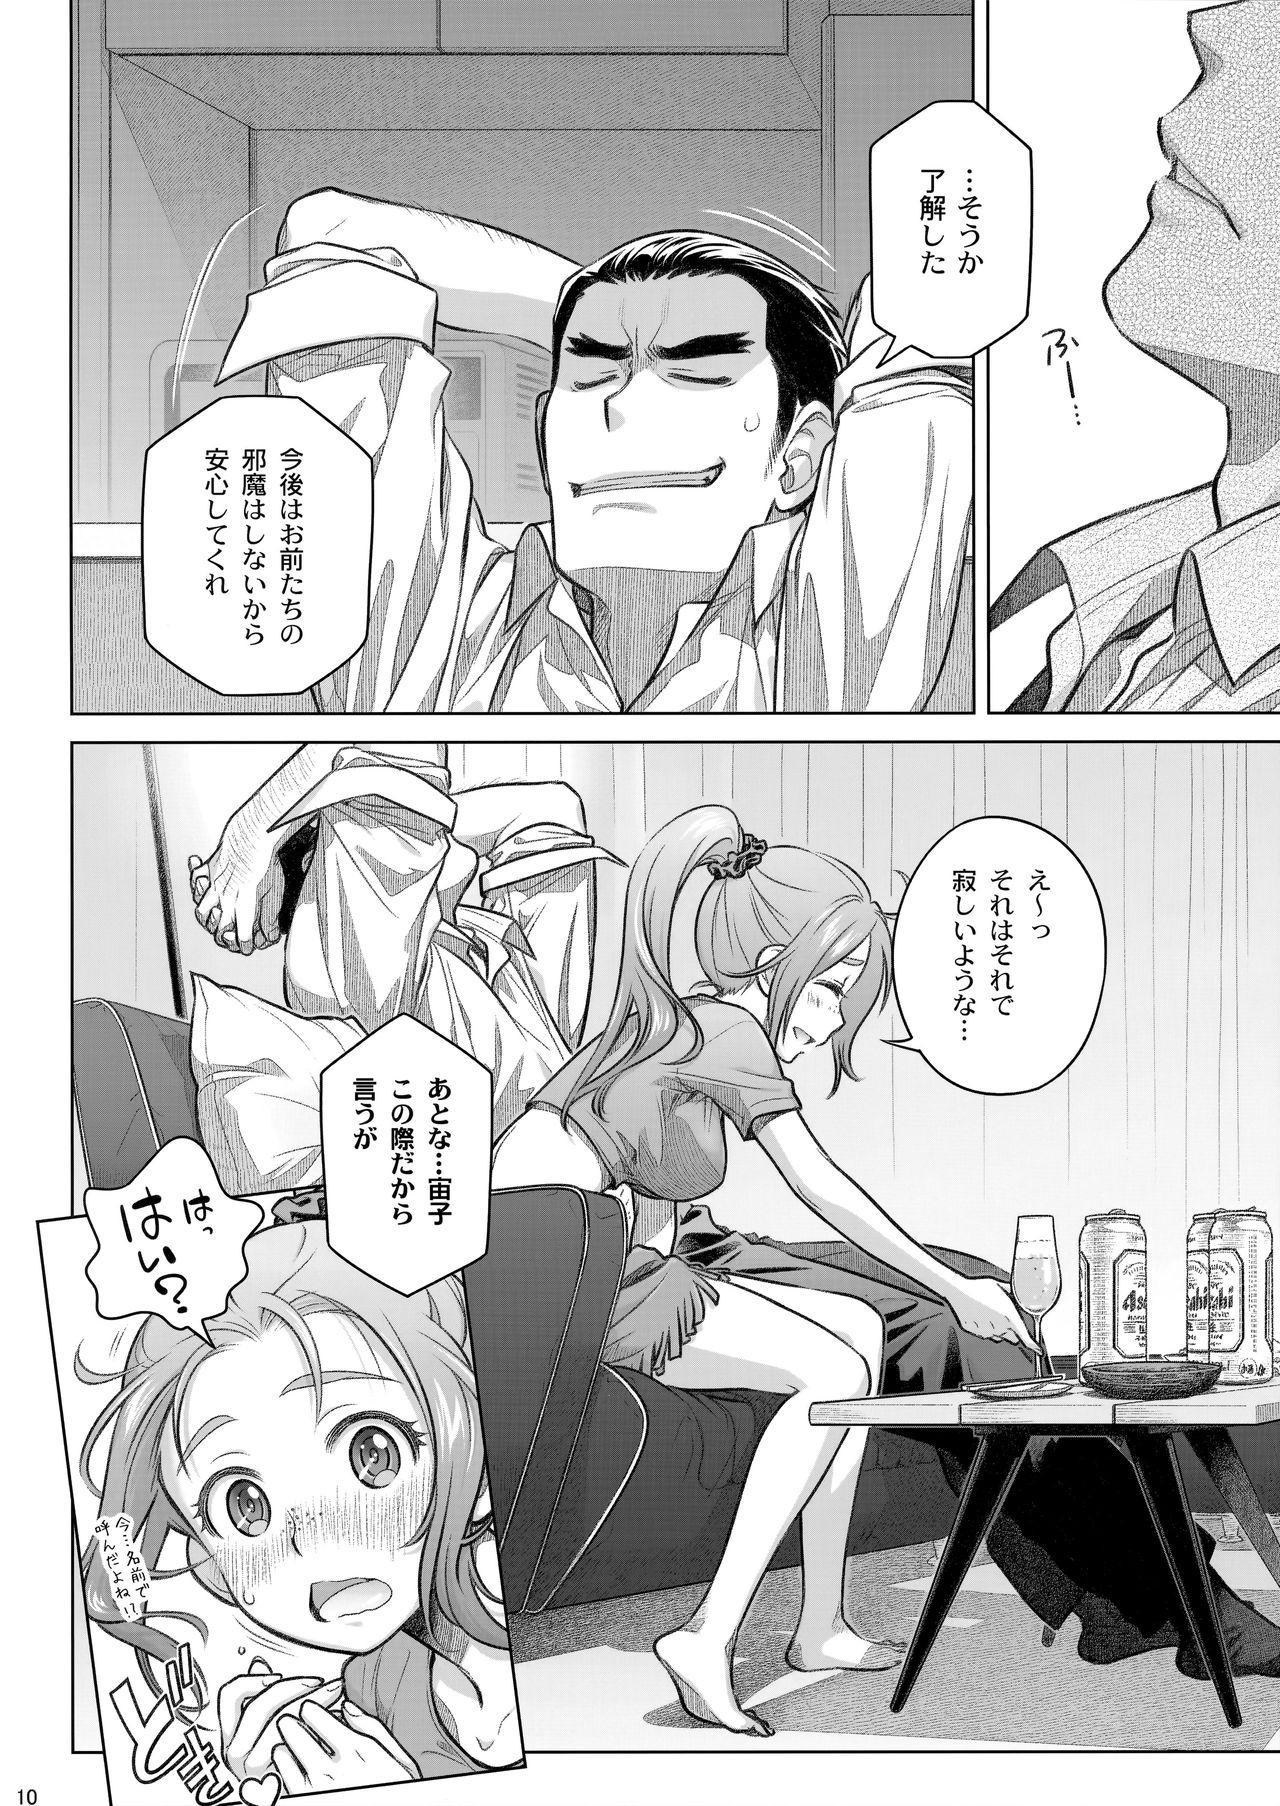 Sorako no Tabi 8 9